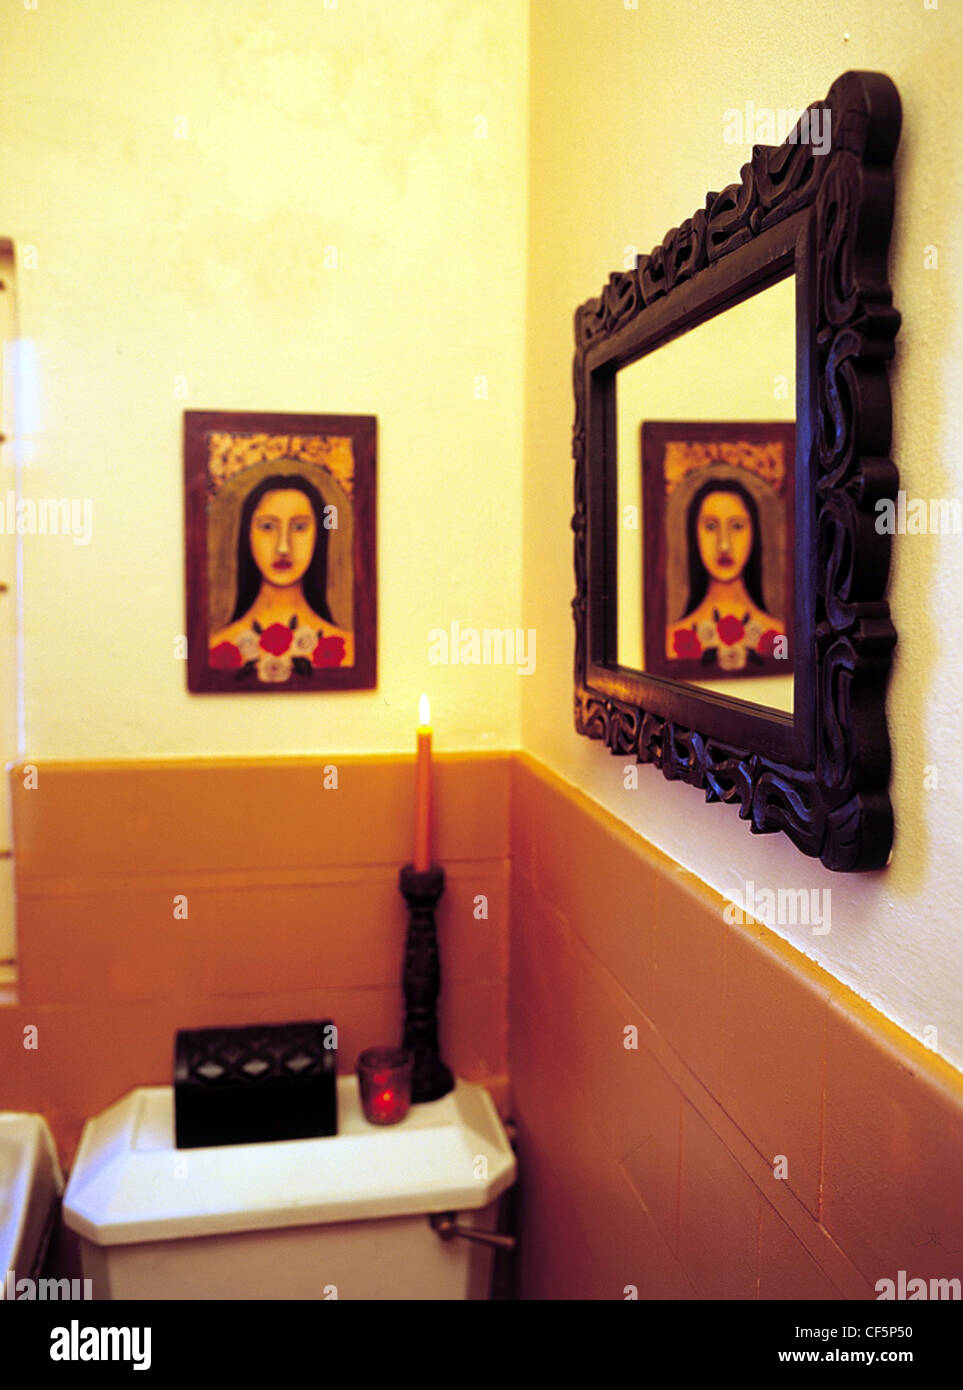 Painted Terracotta Tiles Stock Photos & Painted Terracotta Tiles ...